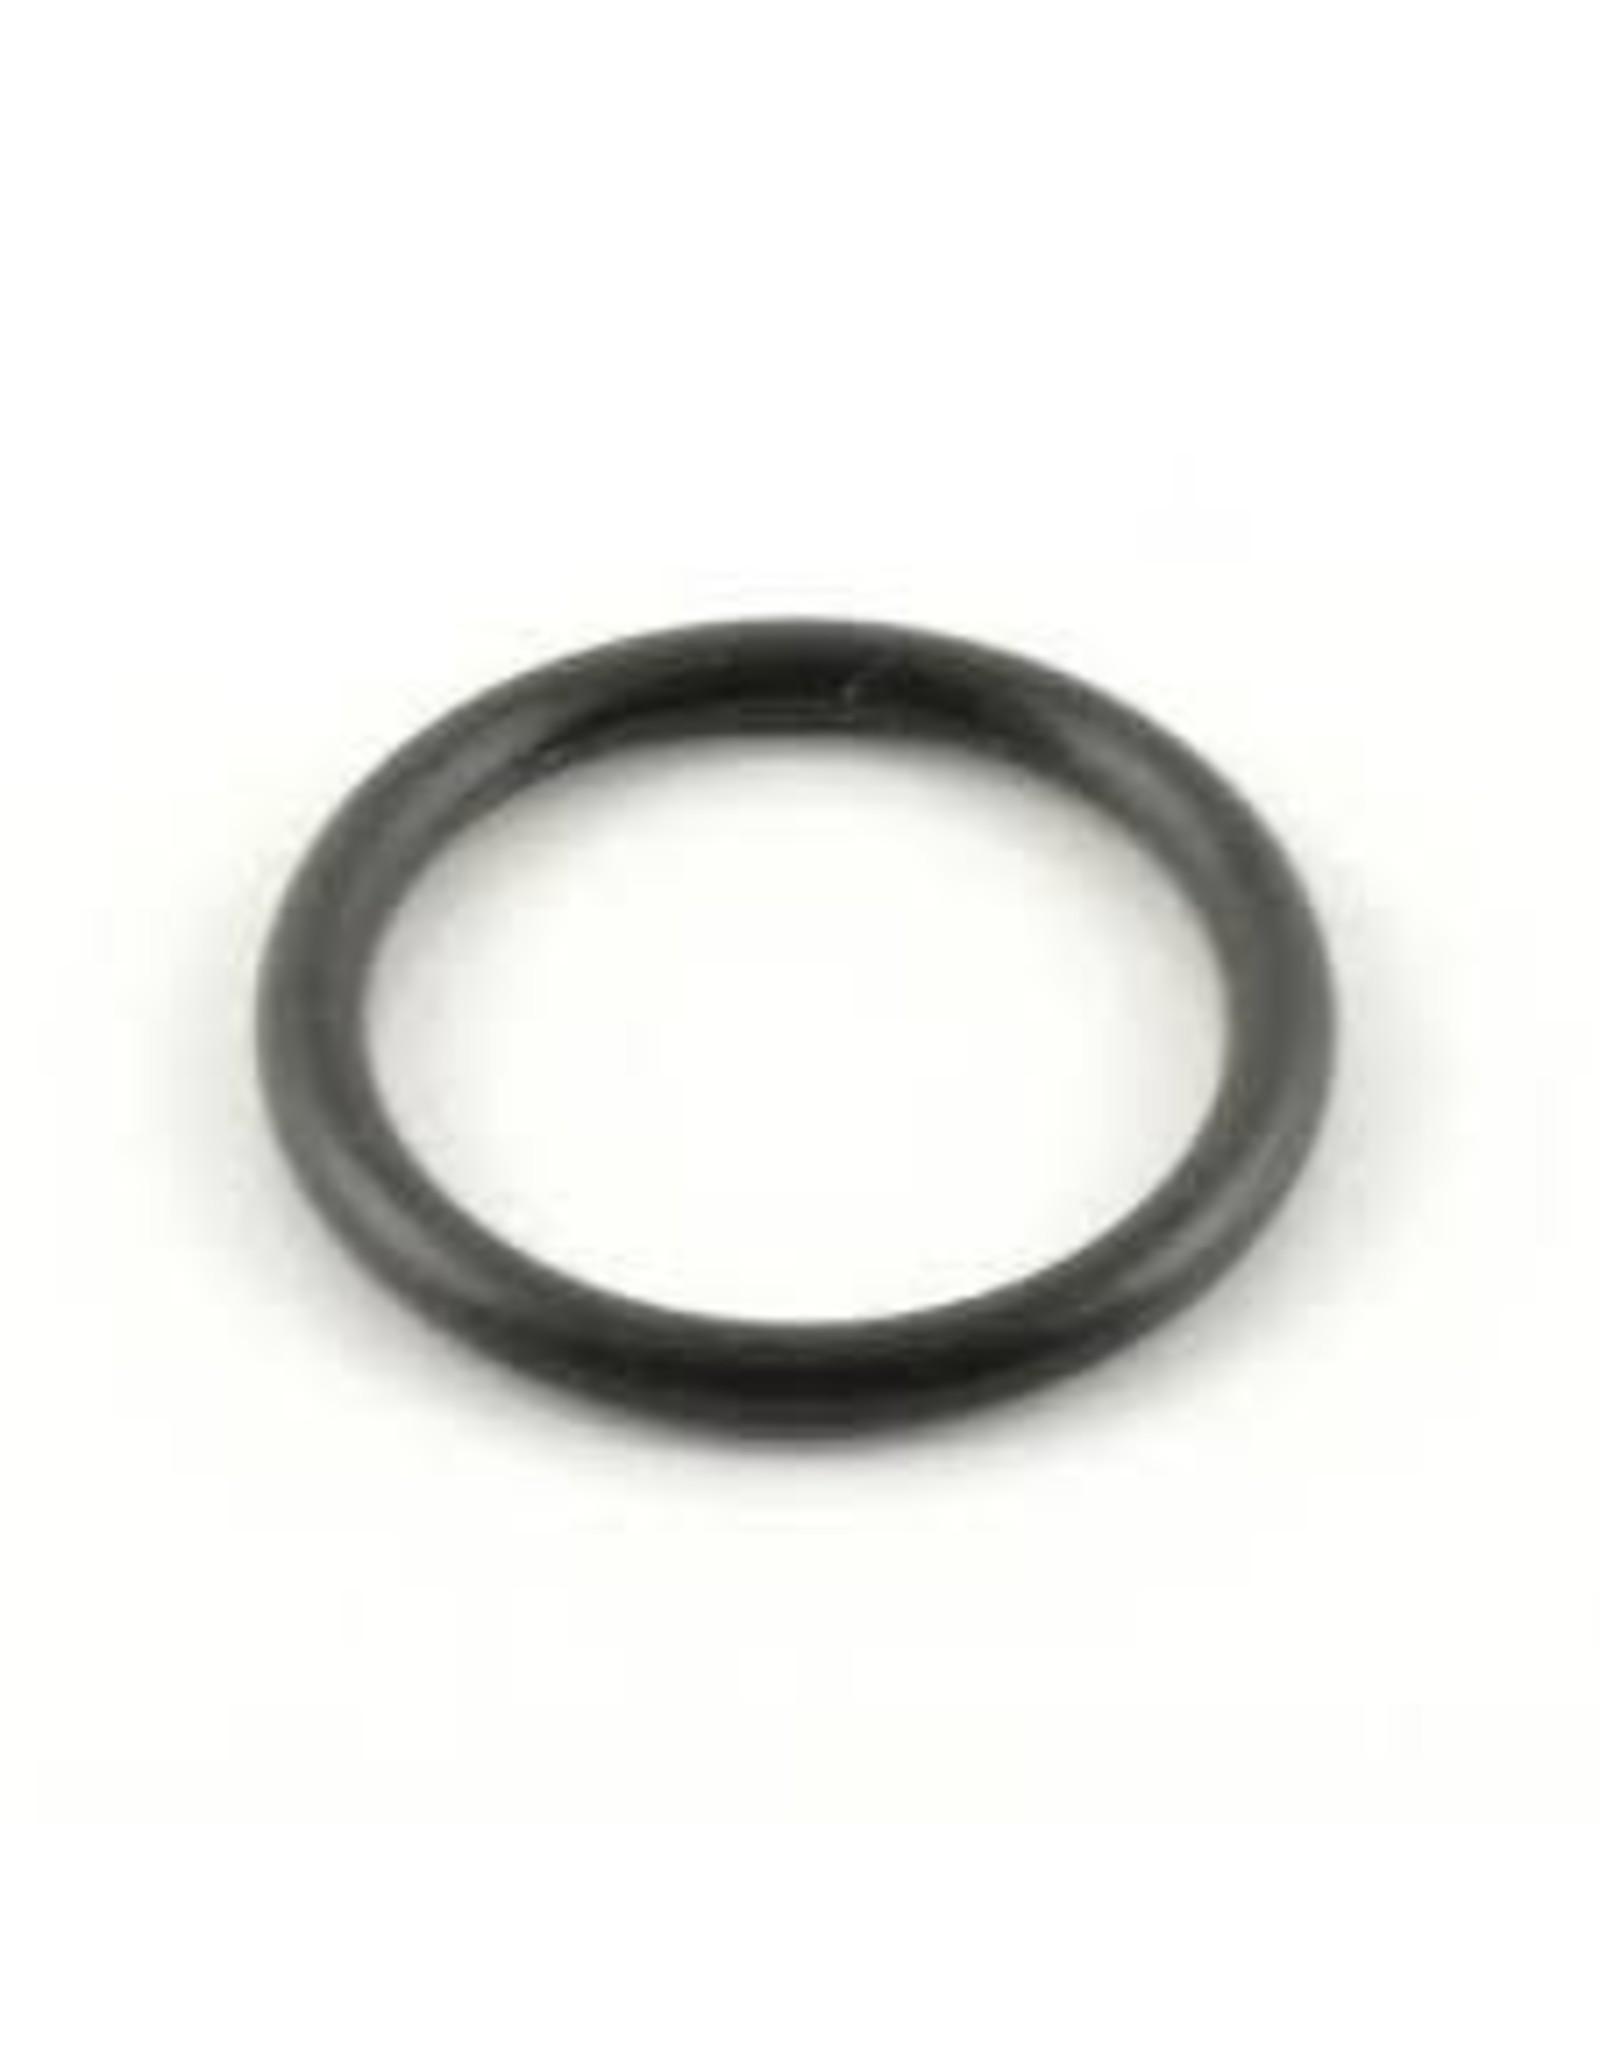 Graco 16Y425 Hand Held Lid O-Ring